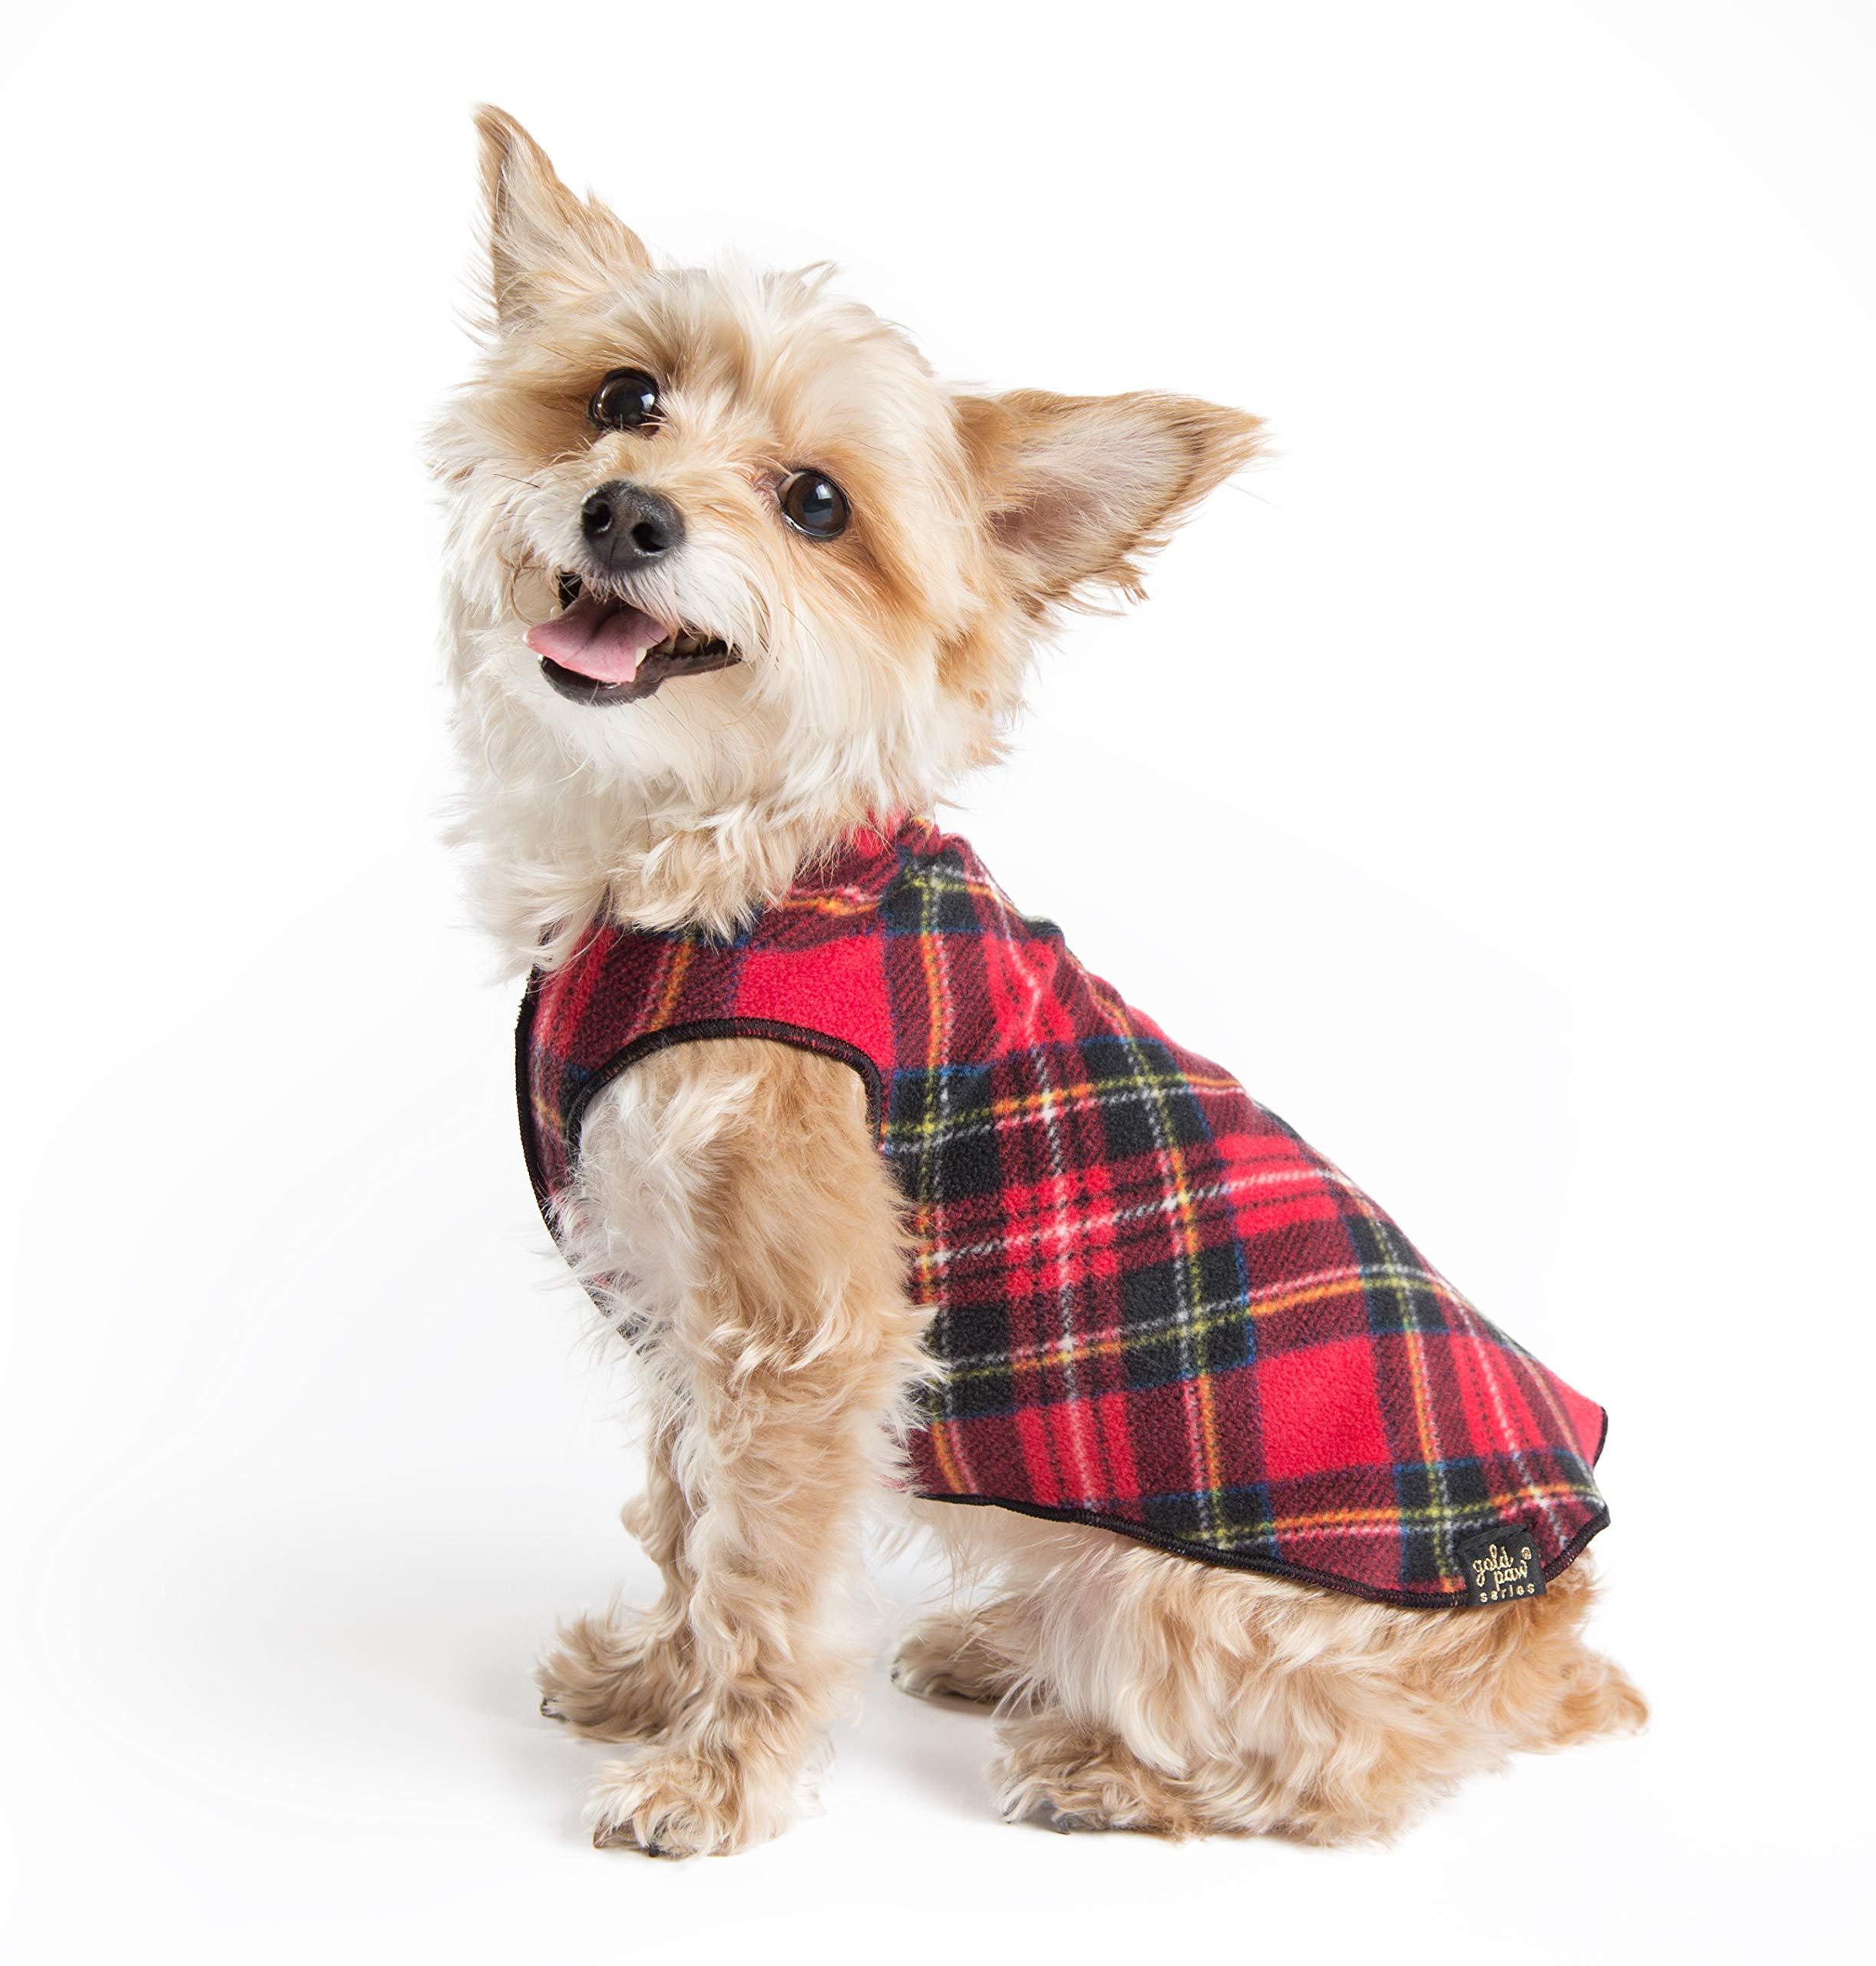 Gold Paw Stretch Fleece Dog Coat - Soft, Warm Dog Clothes, Stretchy Pet Sweater - Machine Washable, Eco Friendly - All Season, Red Classic Plaid, Size 30